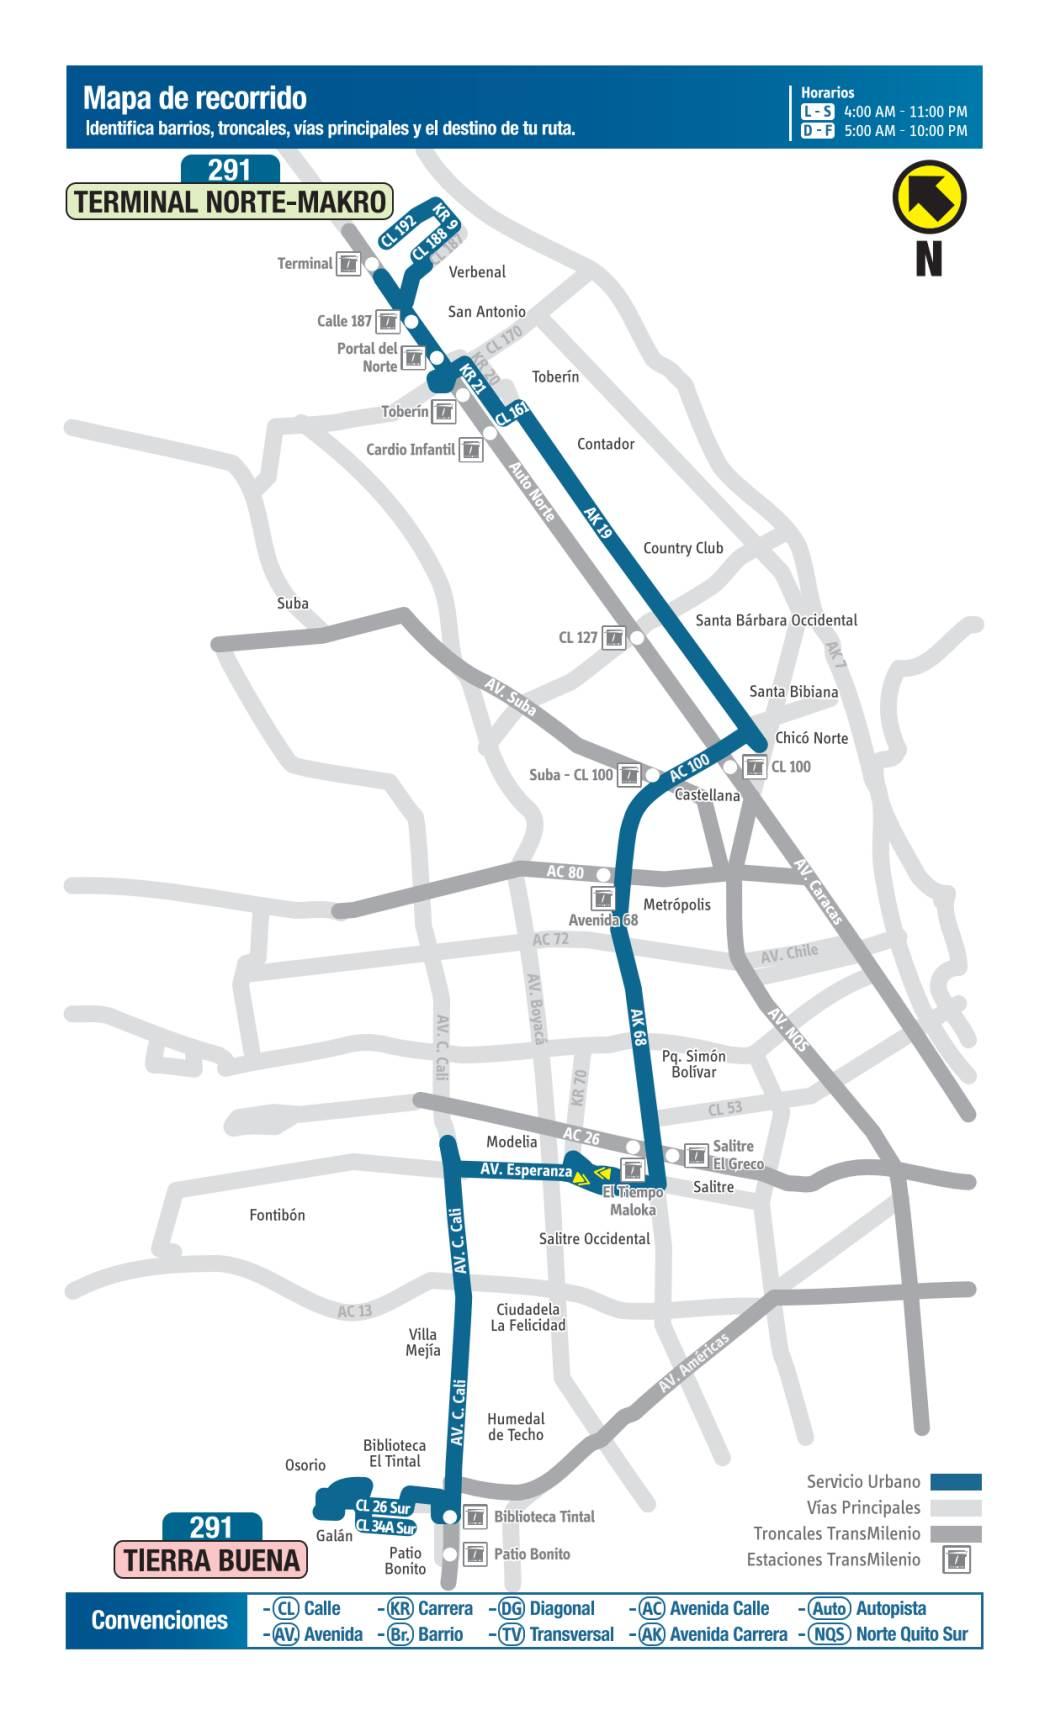 291 Terminal Norte, Makro - Tierra Buena, mapa bus urbano Bogotá